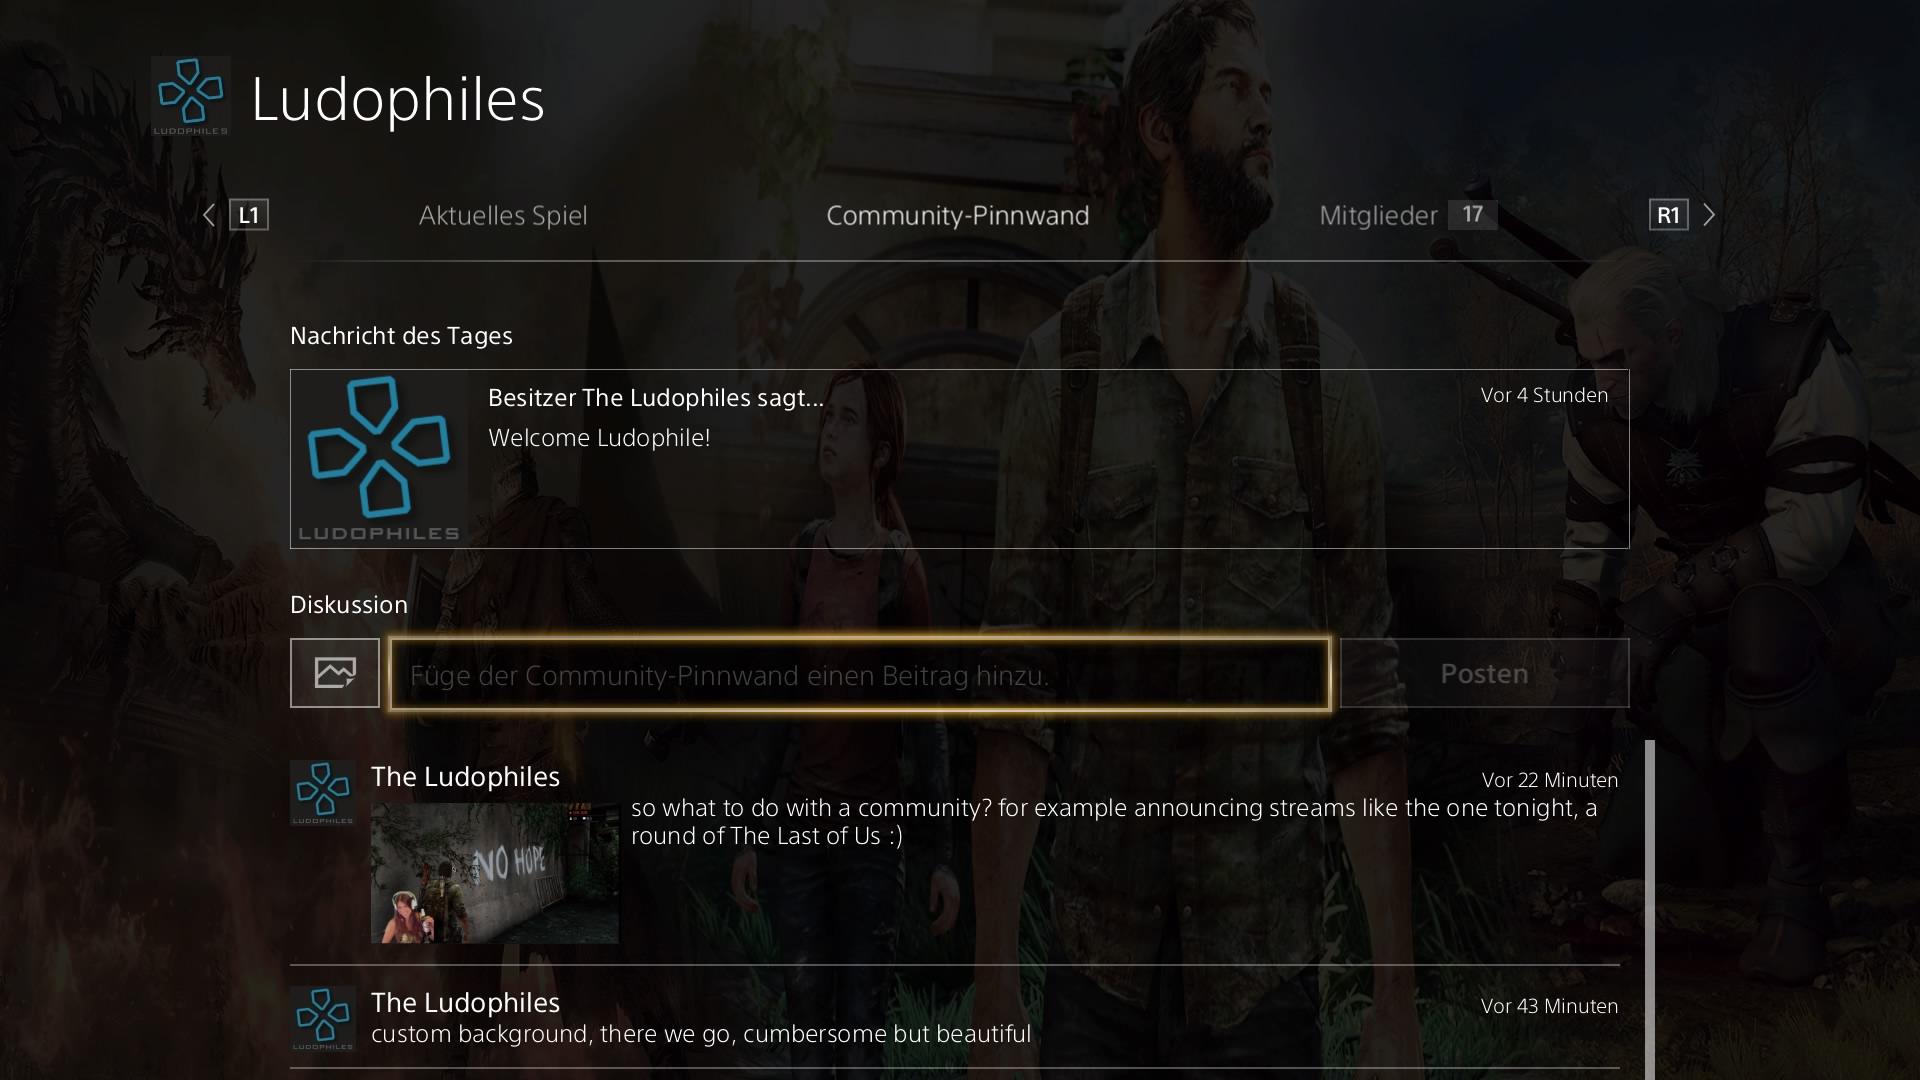 Ludophiles-PlayStation-Community.jpg